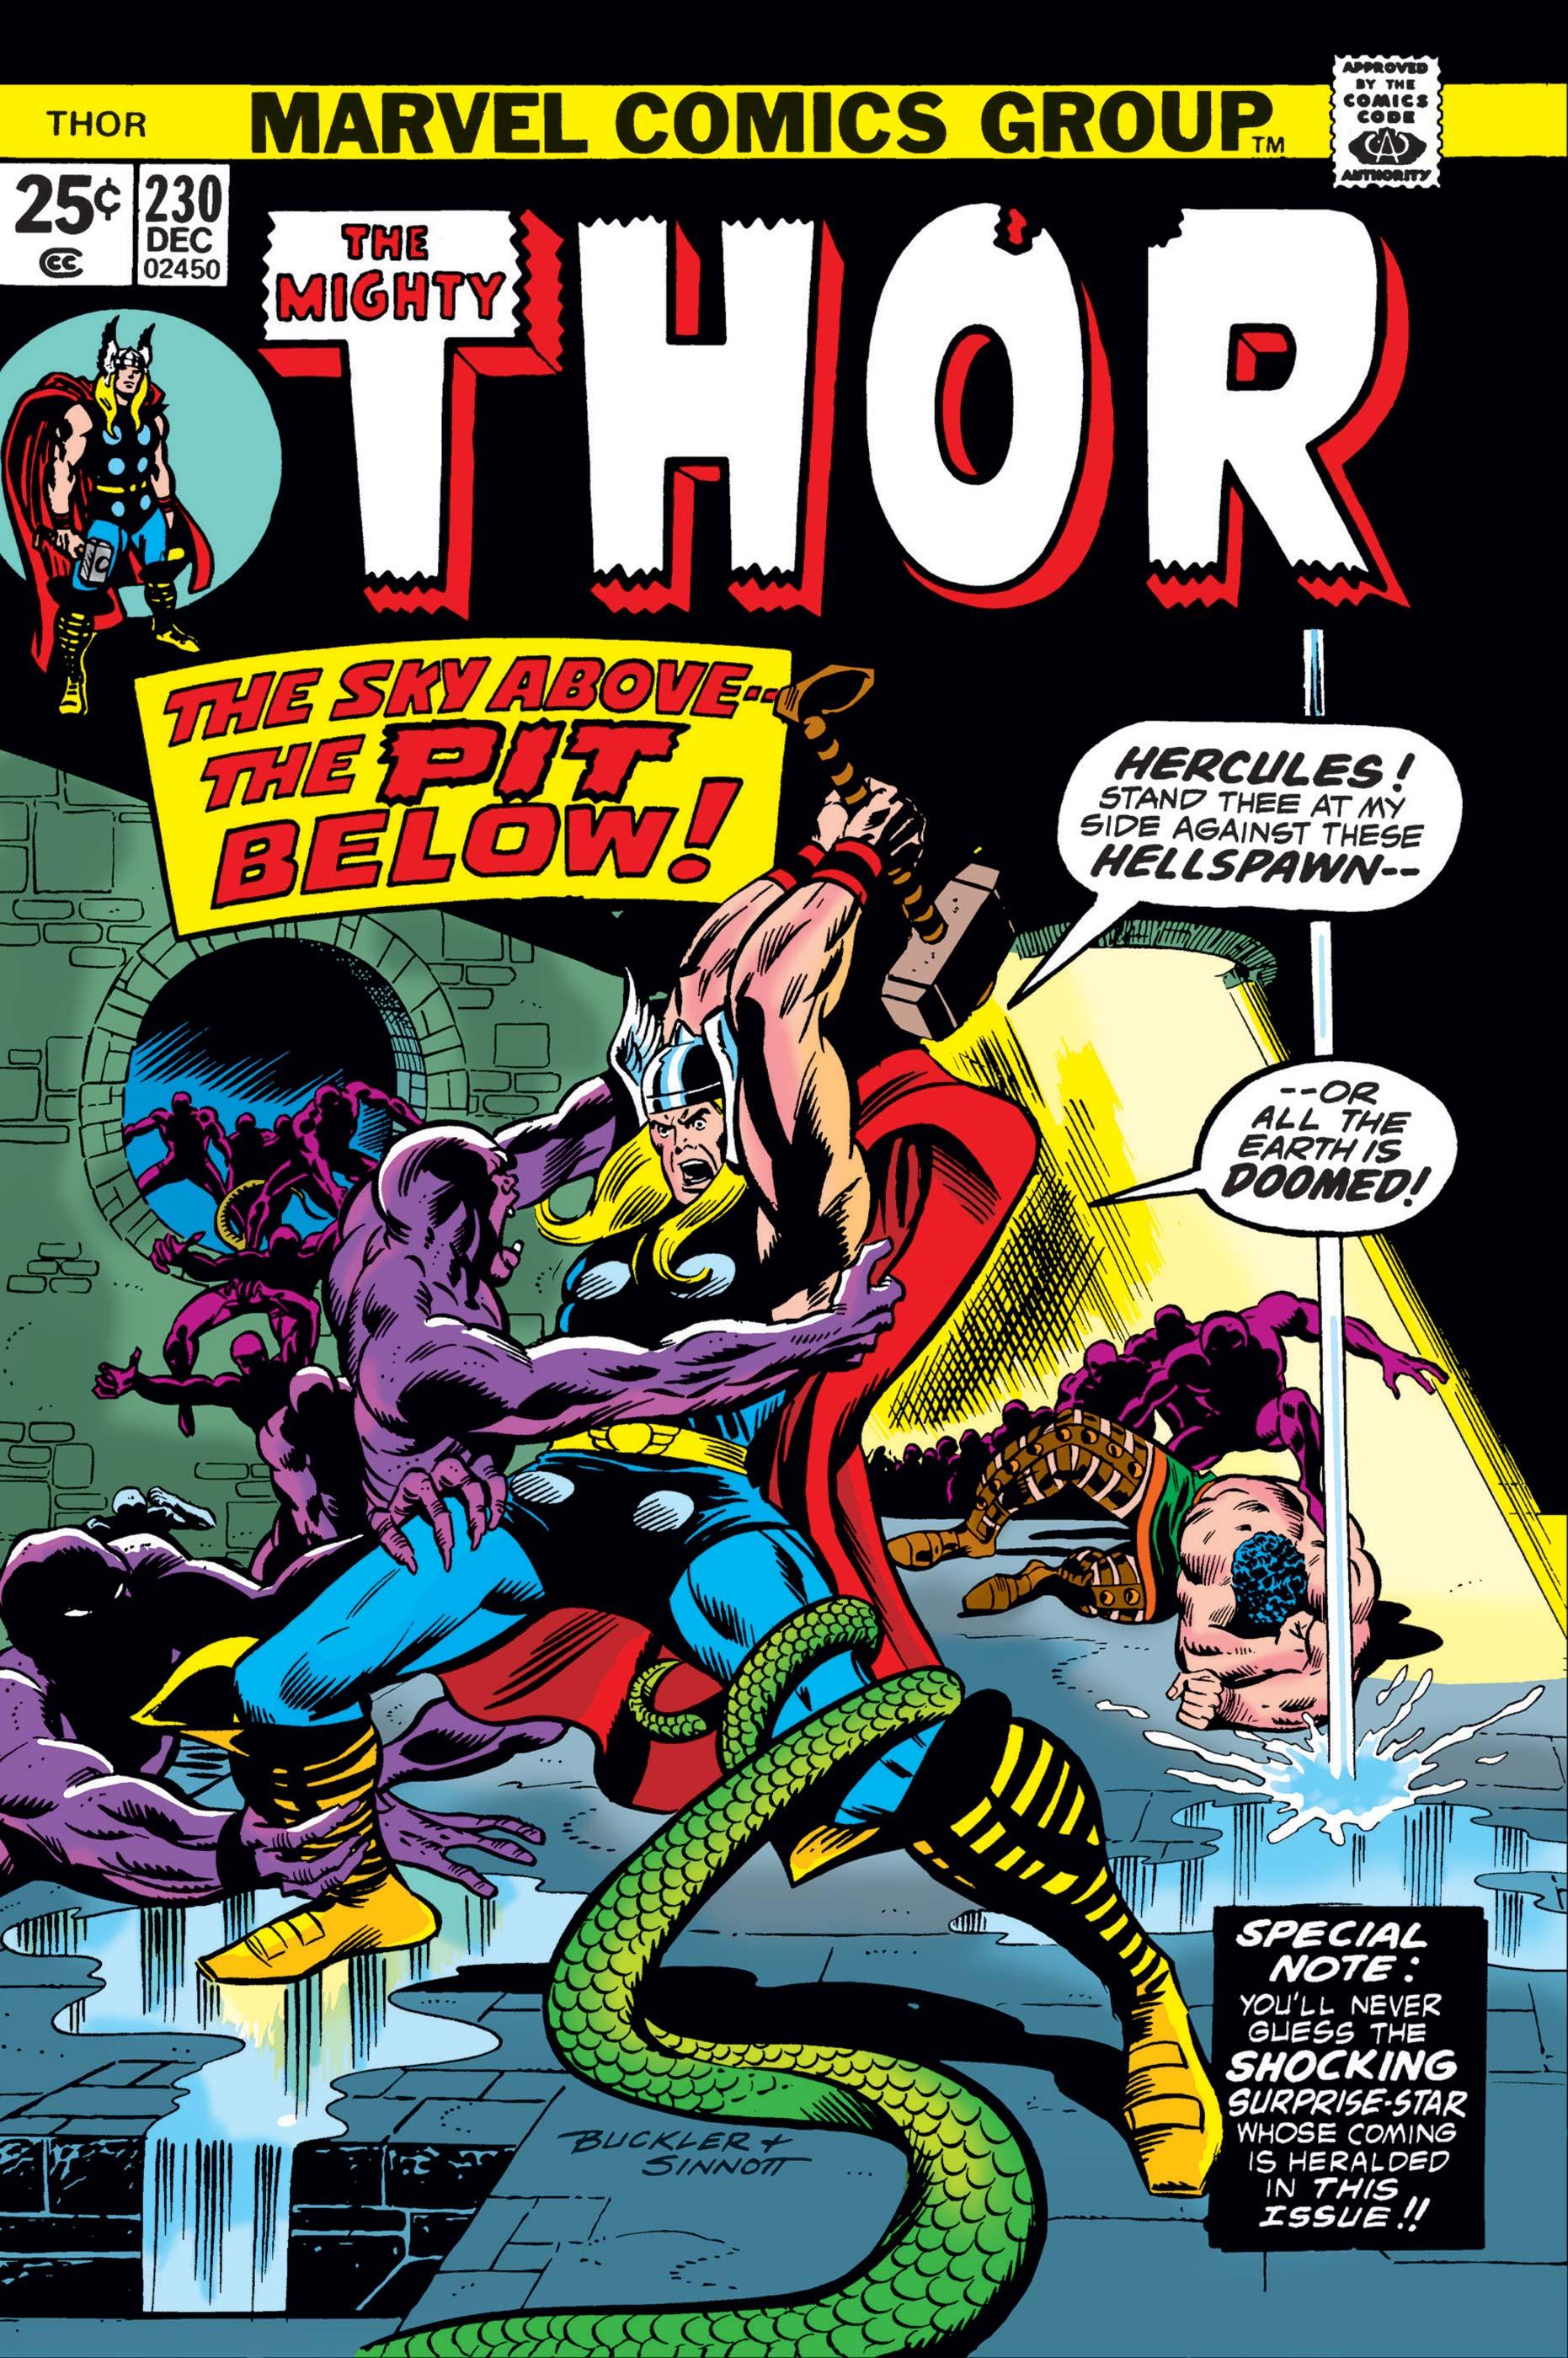 Thor (1966) #230